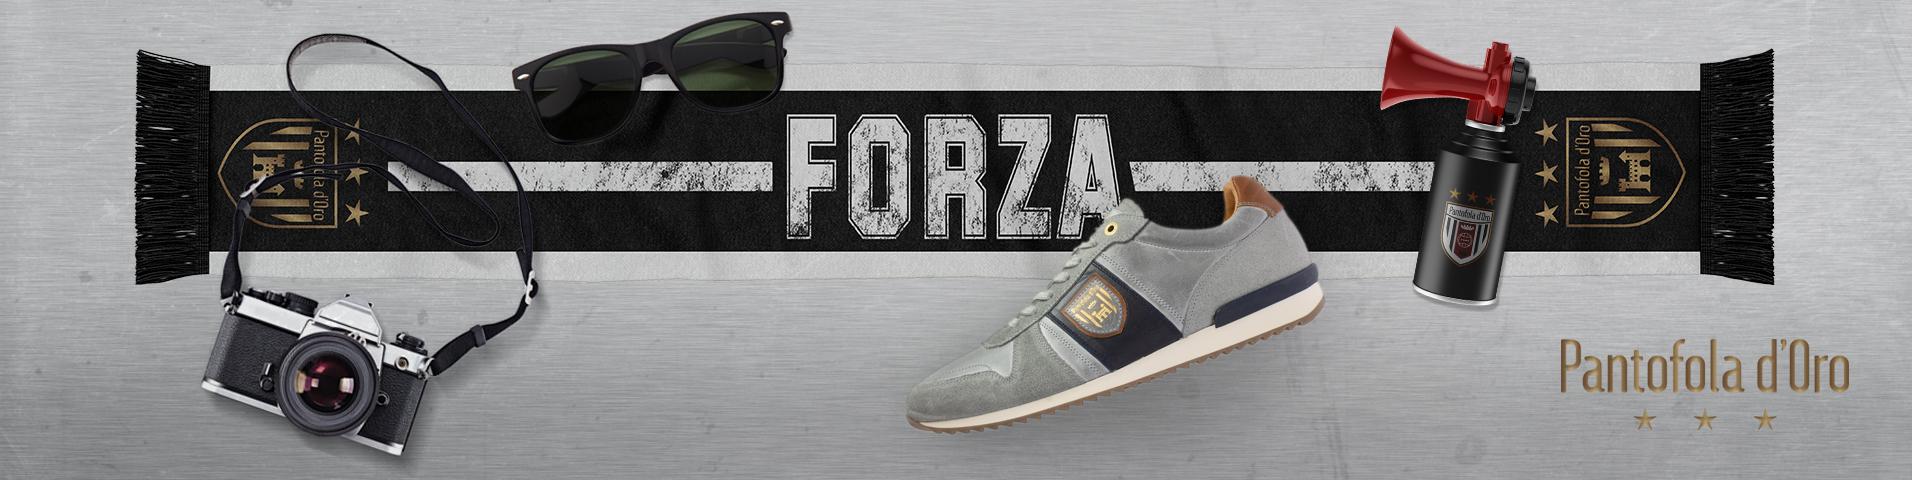 timeless design e25a2 efbf6 Schuhe von Pantofola d`Oro